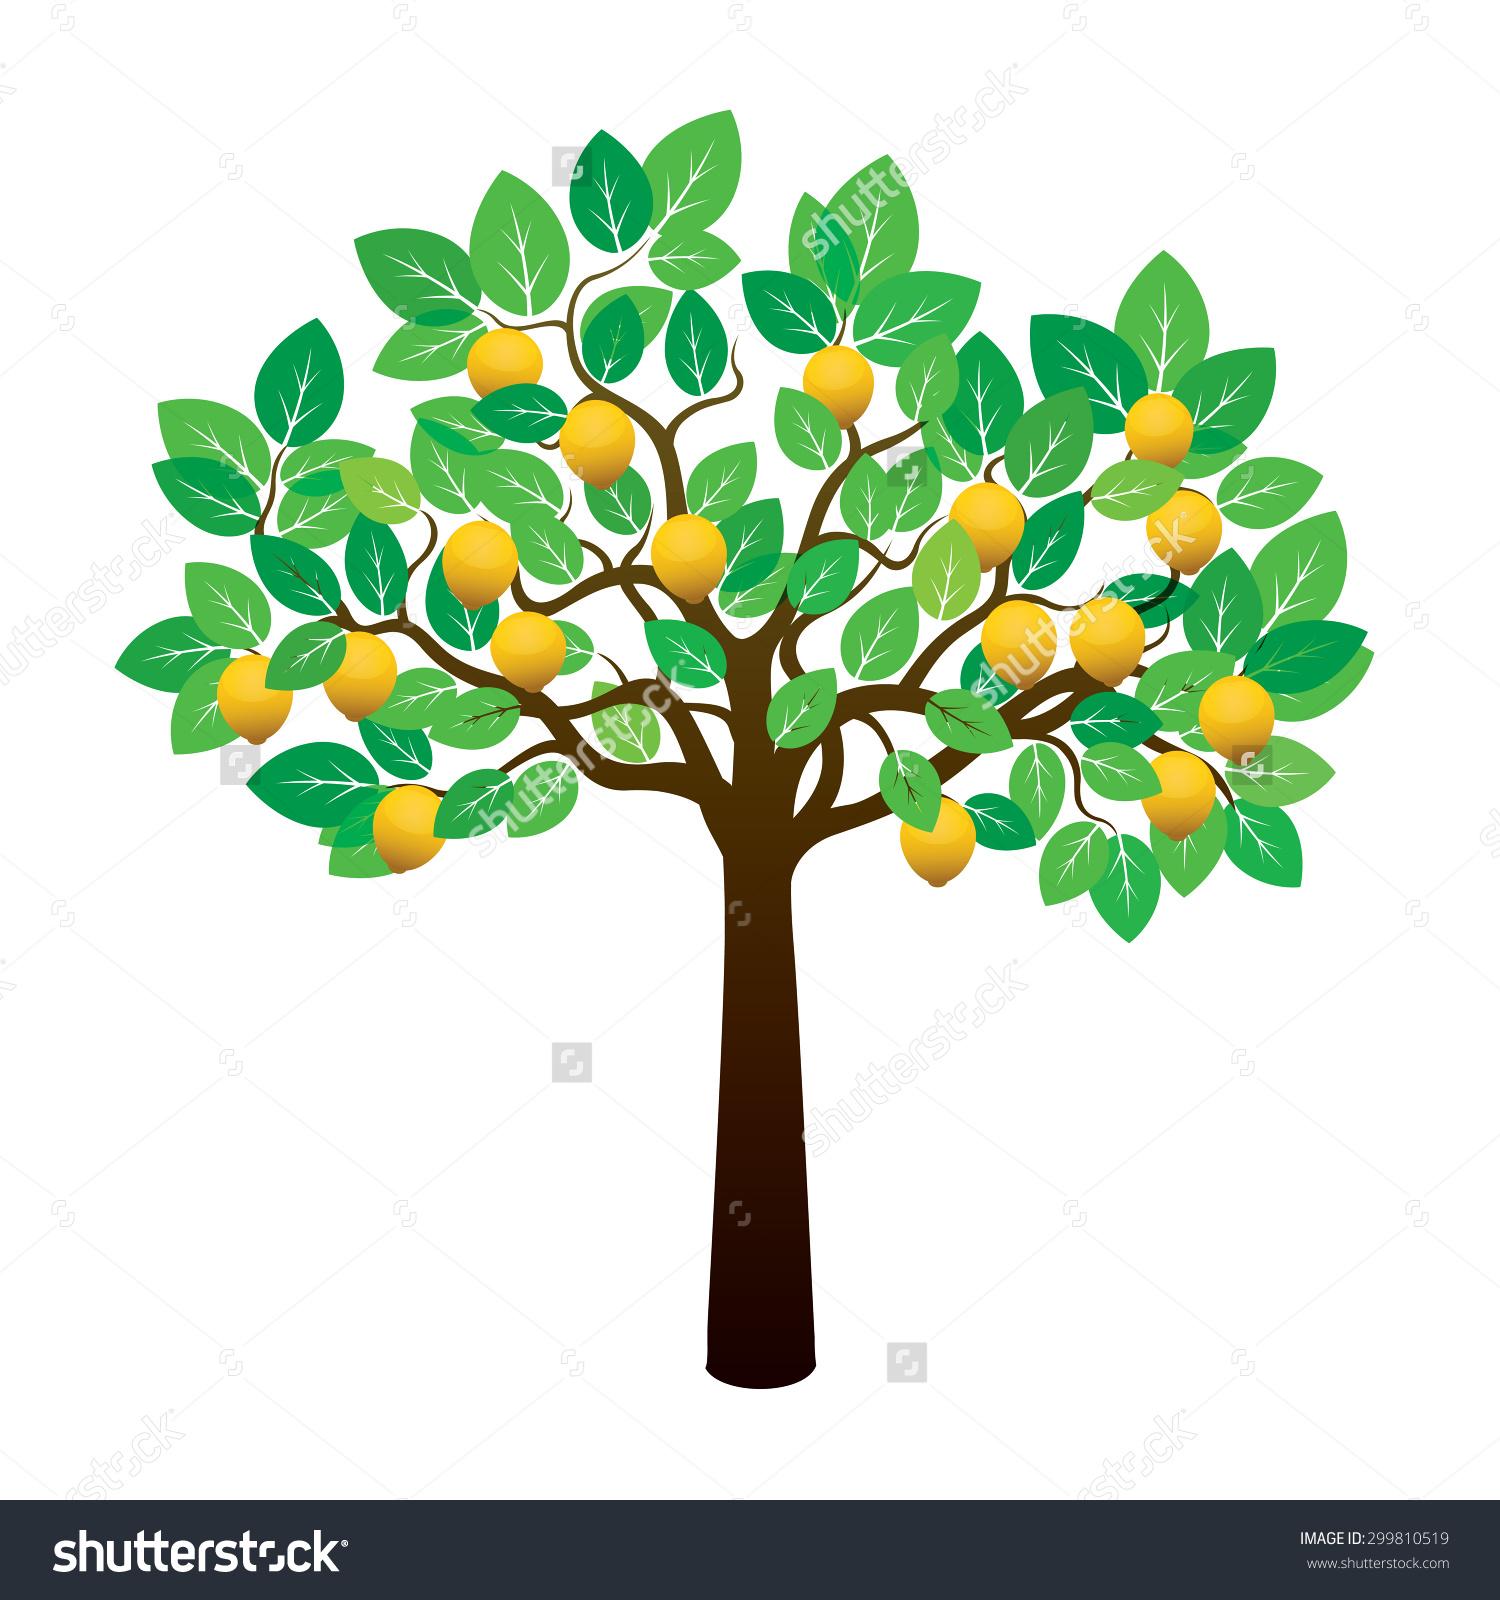 Clipart lemon tree.